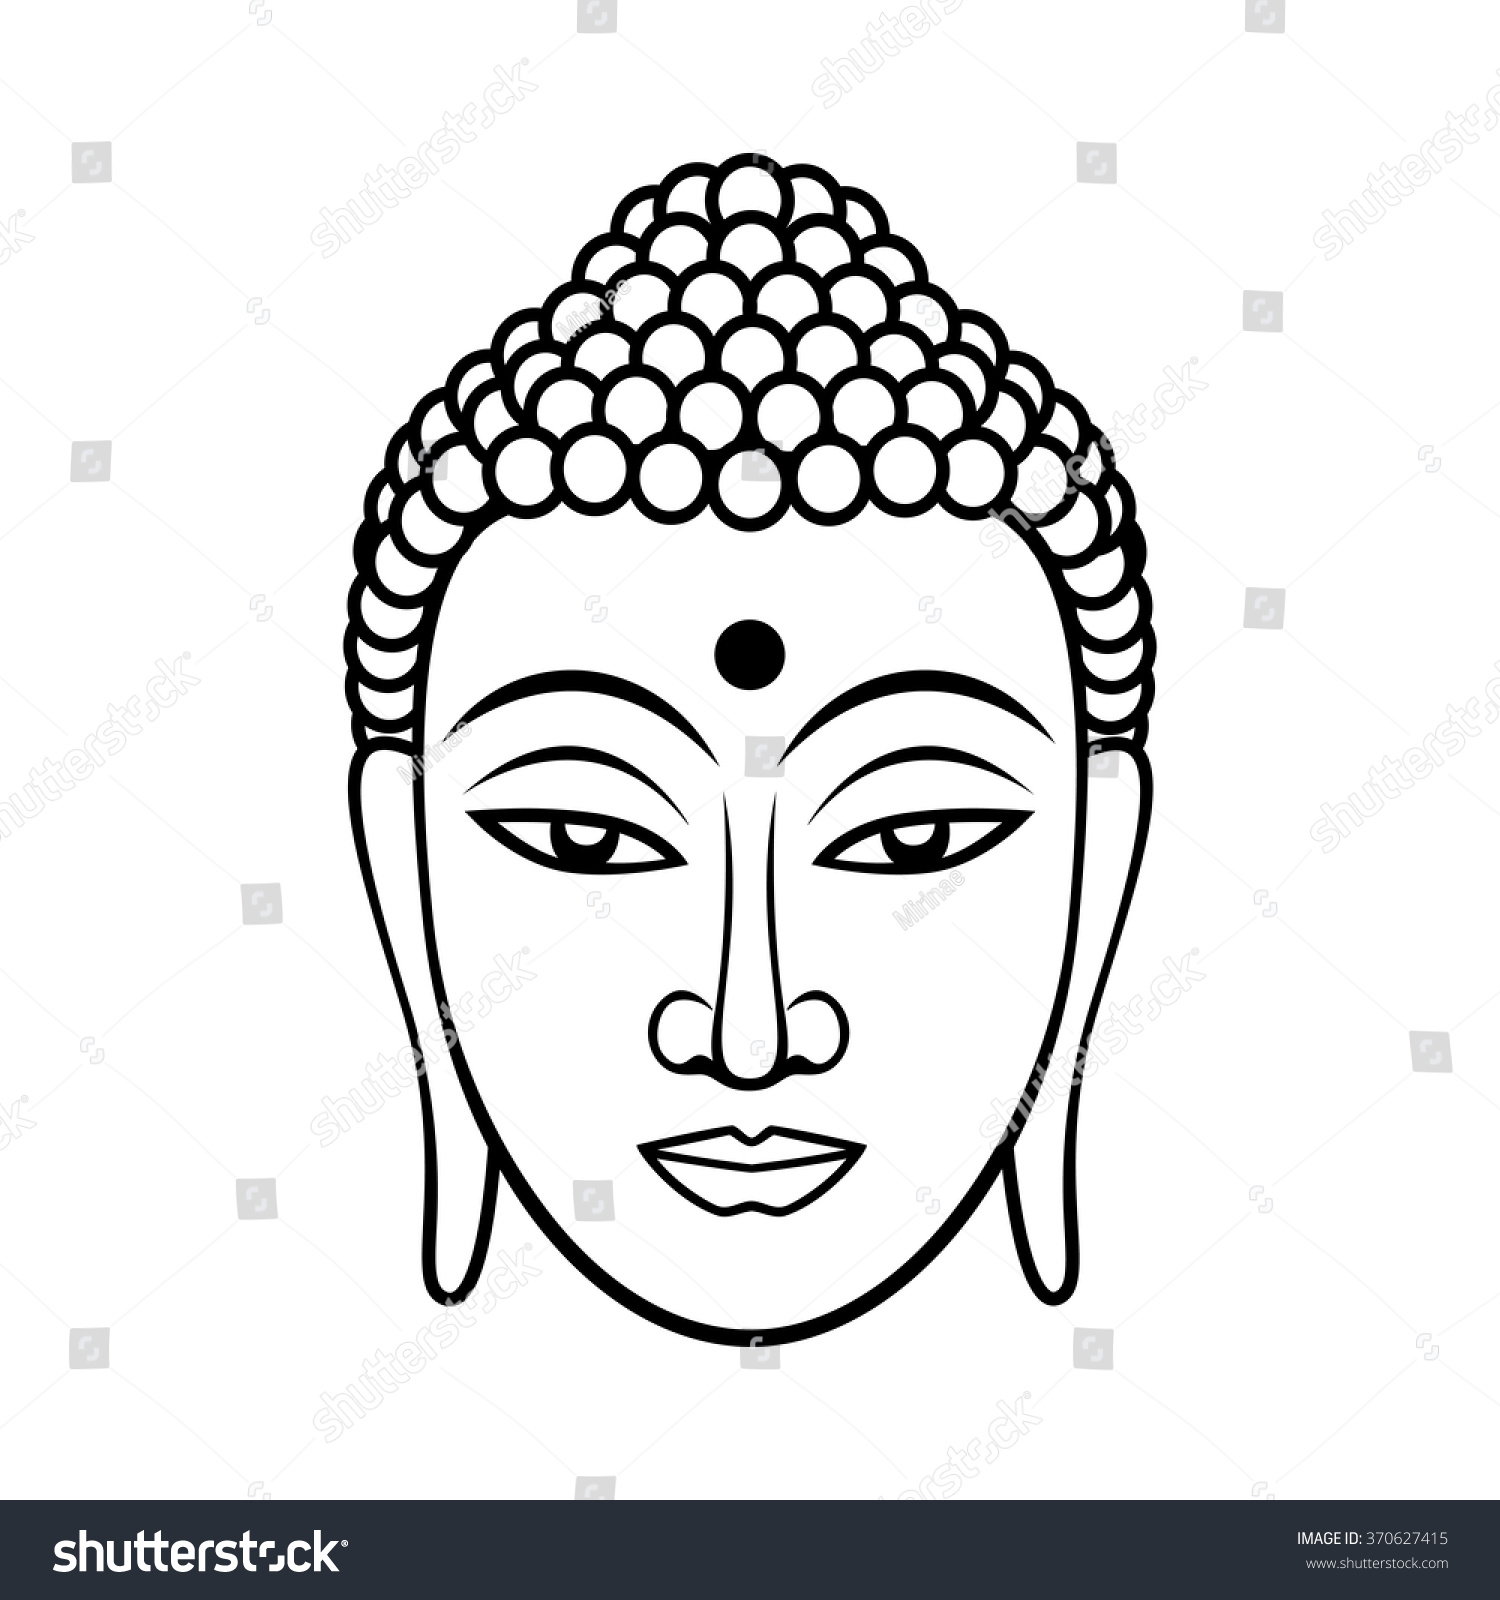 Buddha Face Line Drawing : Buddha face black line illustration on white background